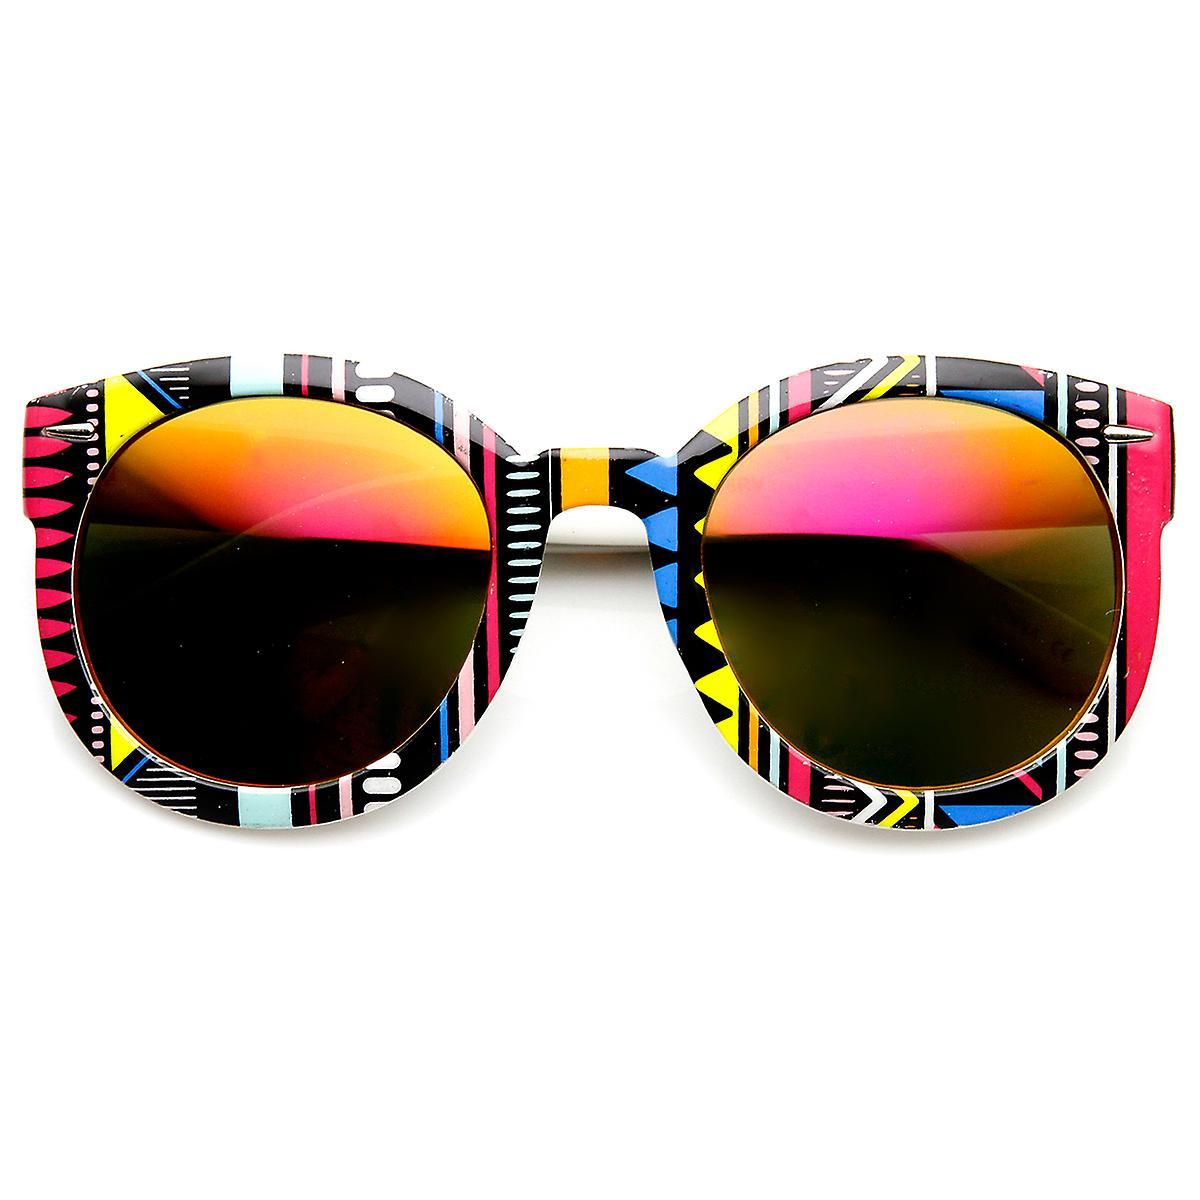 48f744202ea Womens Oversized Native Print Color Mirror Lens Round Sunglasses ...